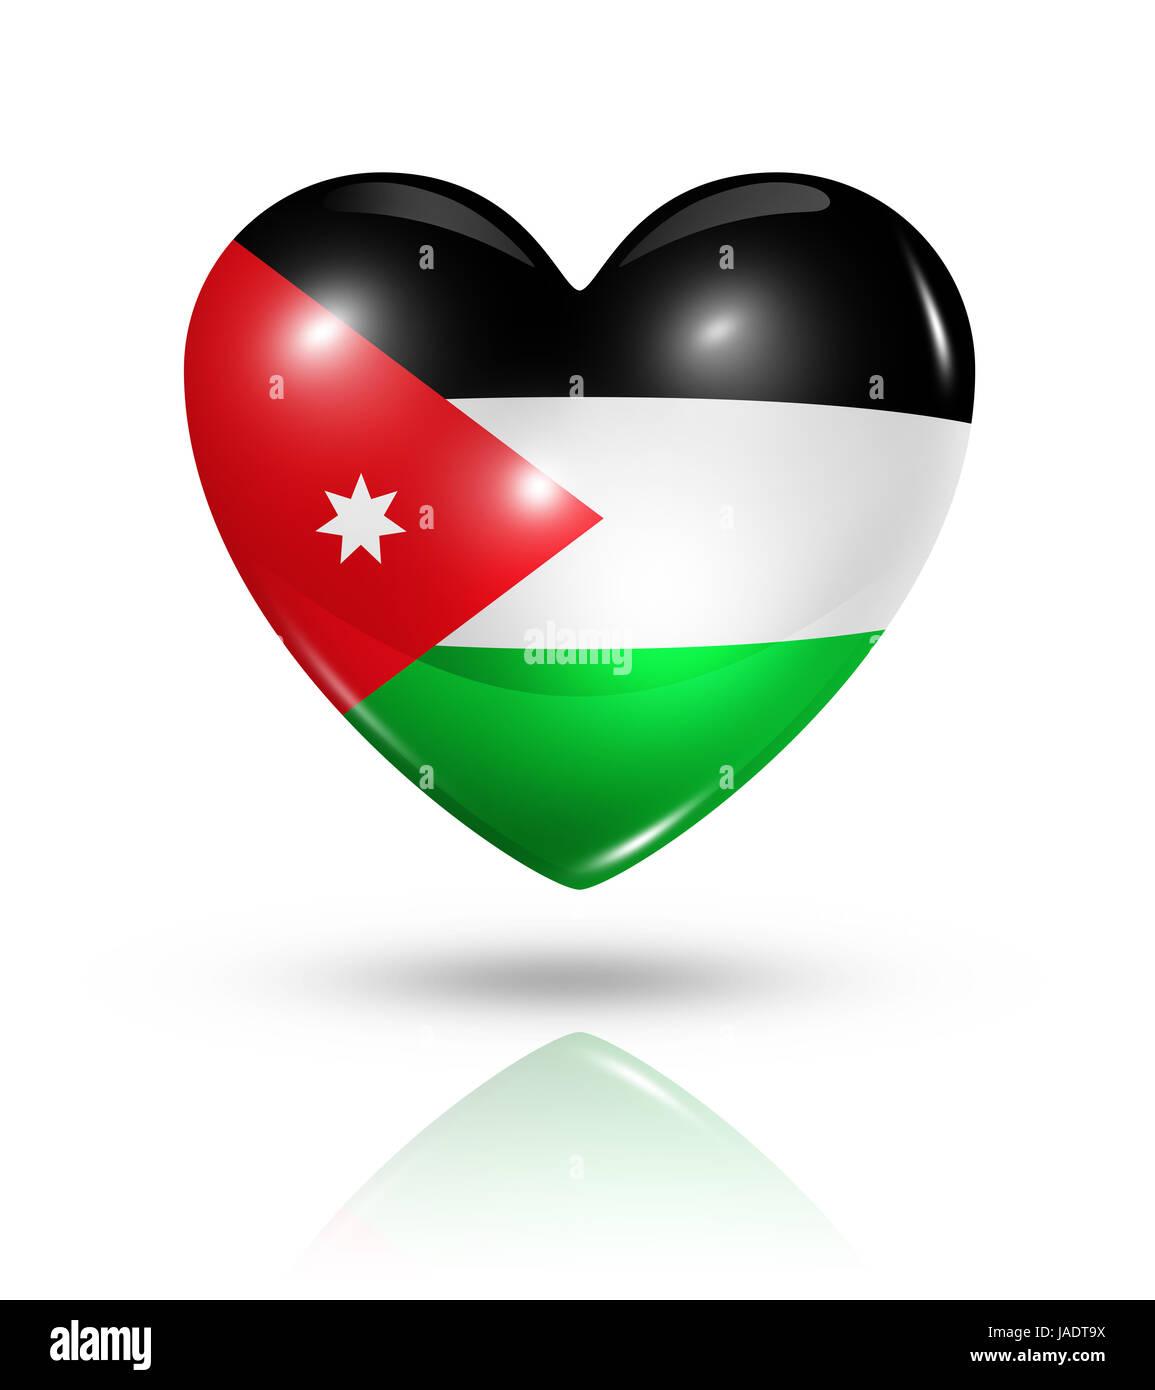 Love jordan symbol 3d heart flag icon isolated on white with love jordan symbol 3d heart flag icon isolated on white with clipping path voltagebd Choice Image